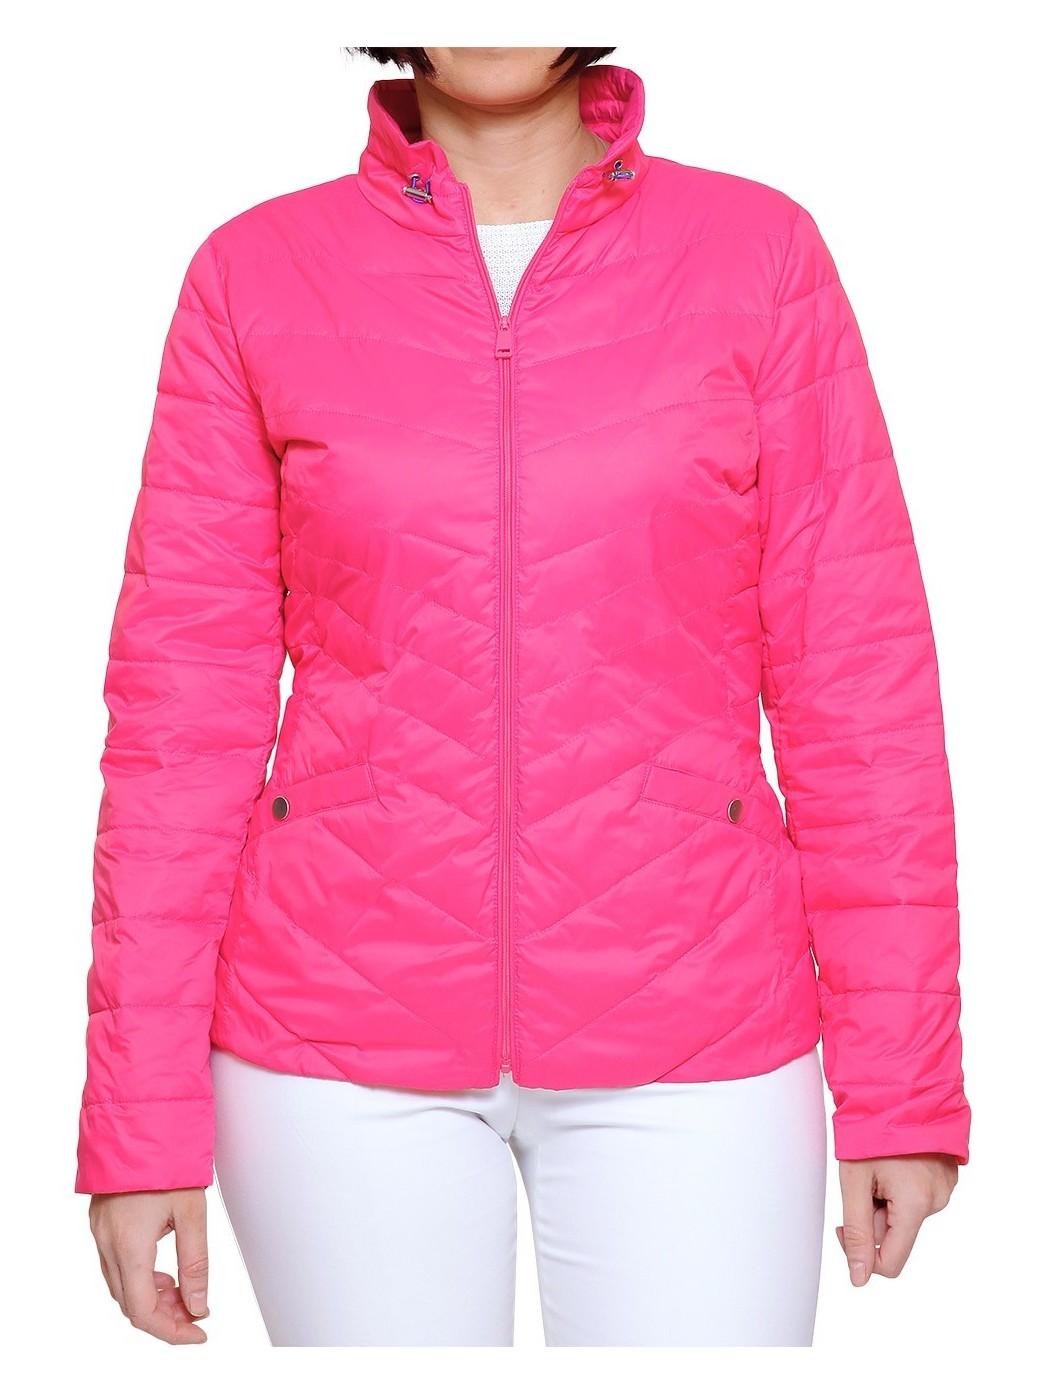 Concept K quilt jacket